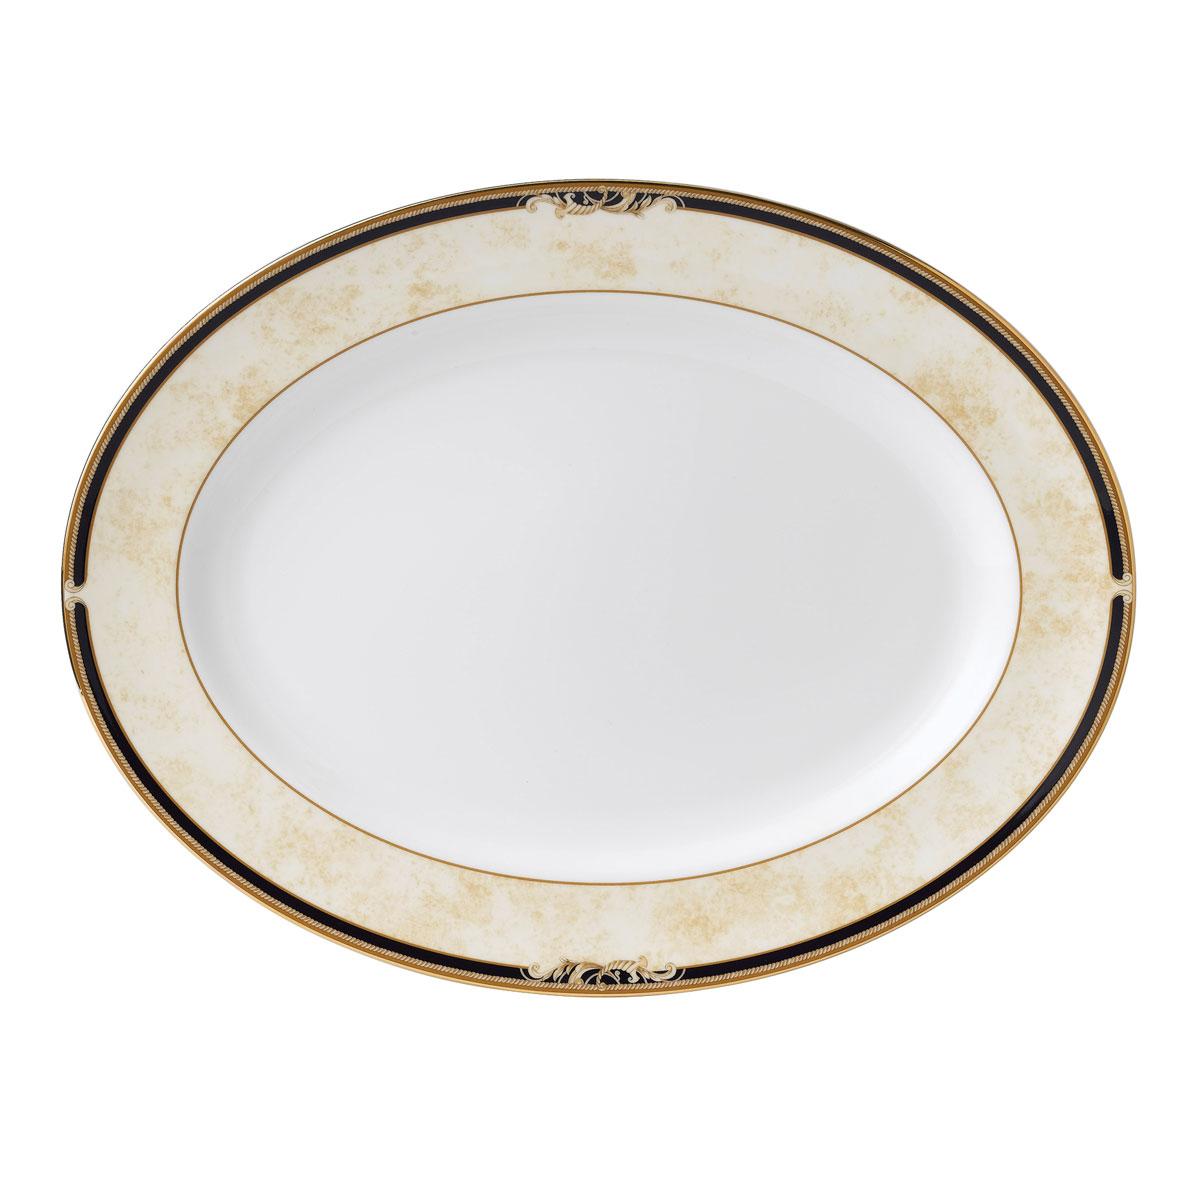 "Wedgwood Cornucopia Oval Platter 15.25"""